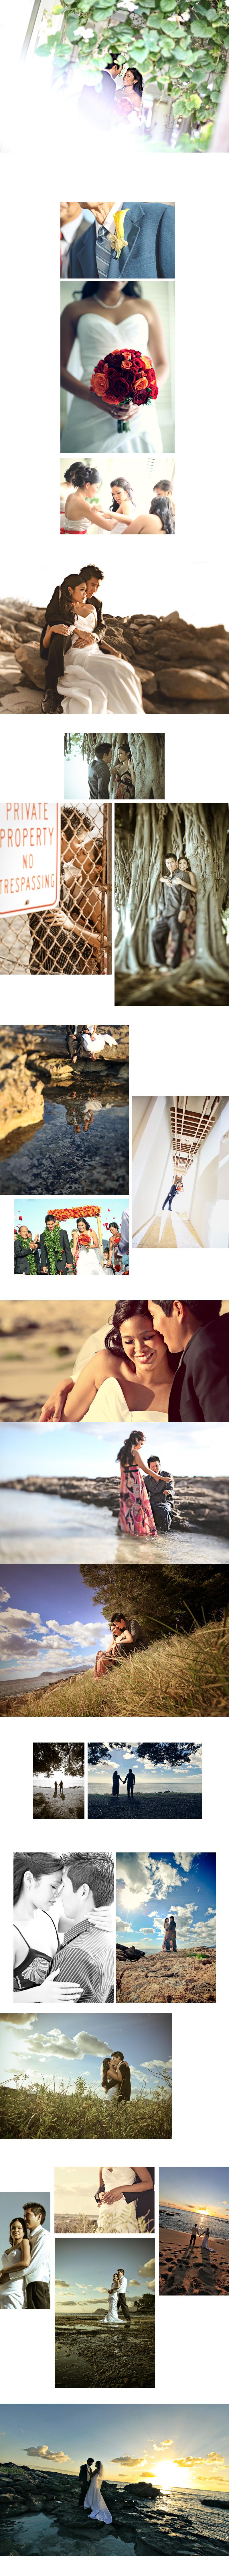 Shawn Starr : Modern Wedding Photography : Pittsburgh Wedding Photographer : Halekulani